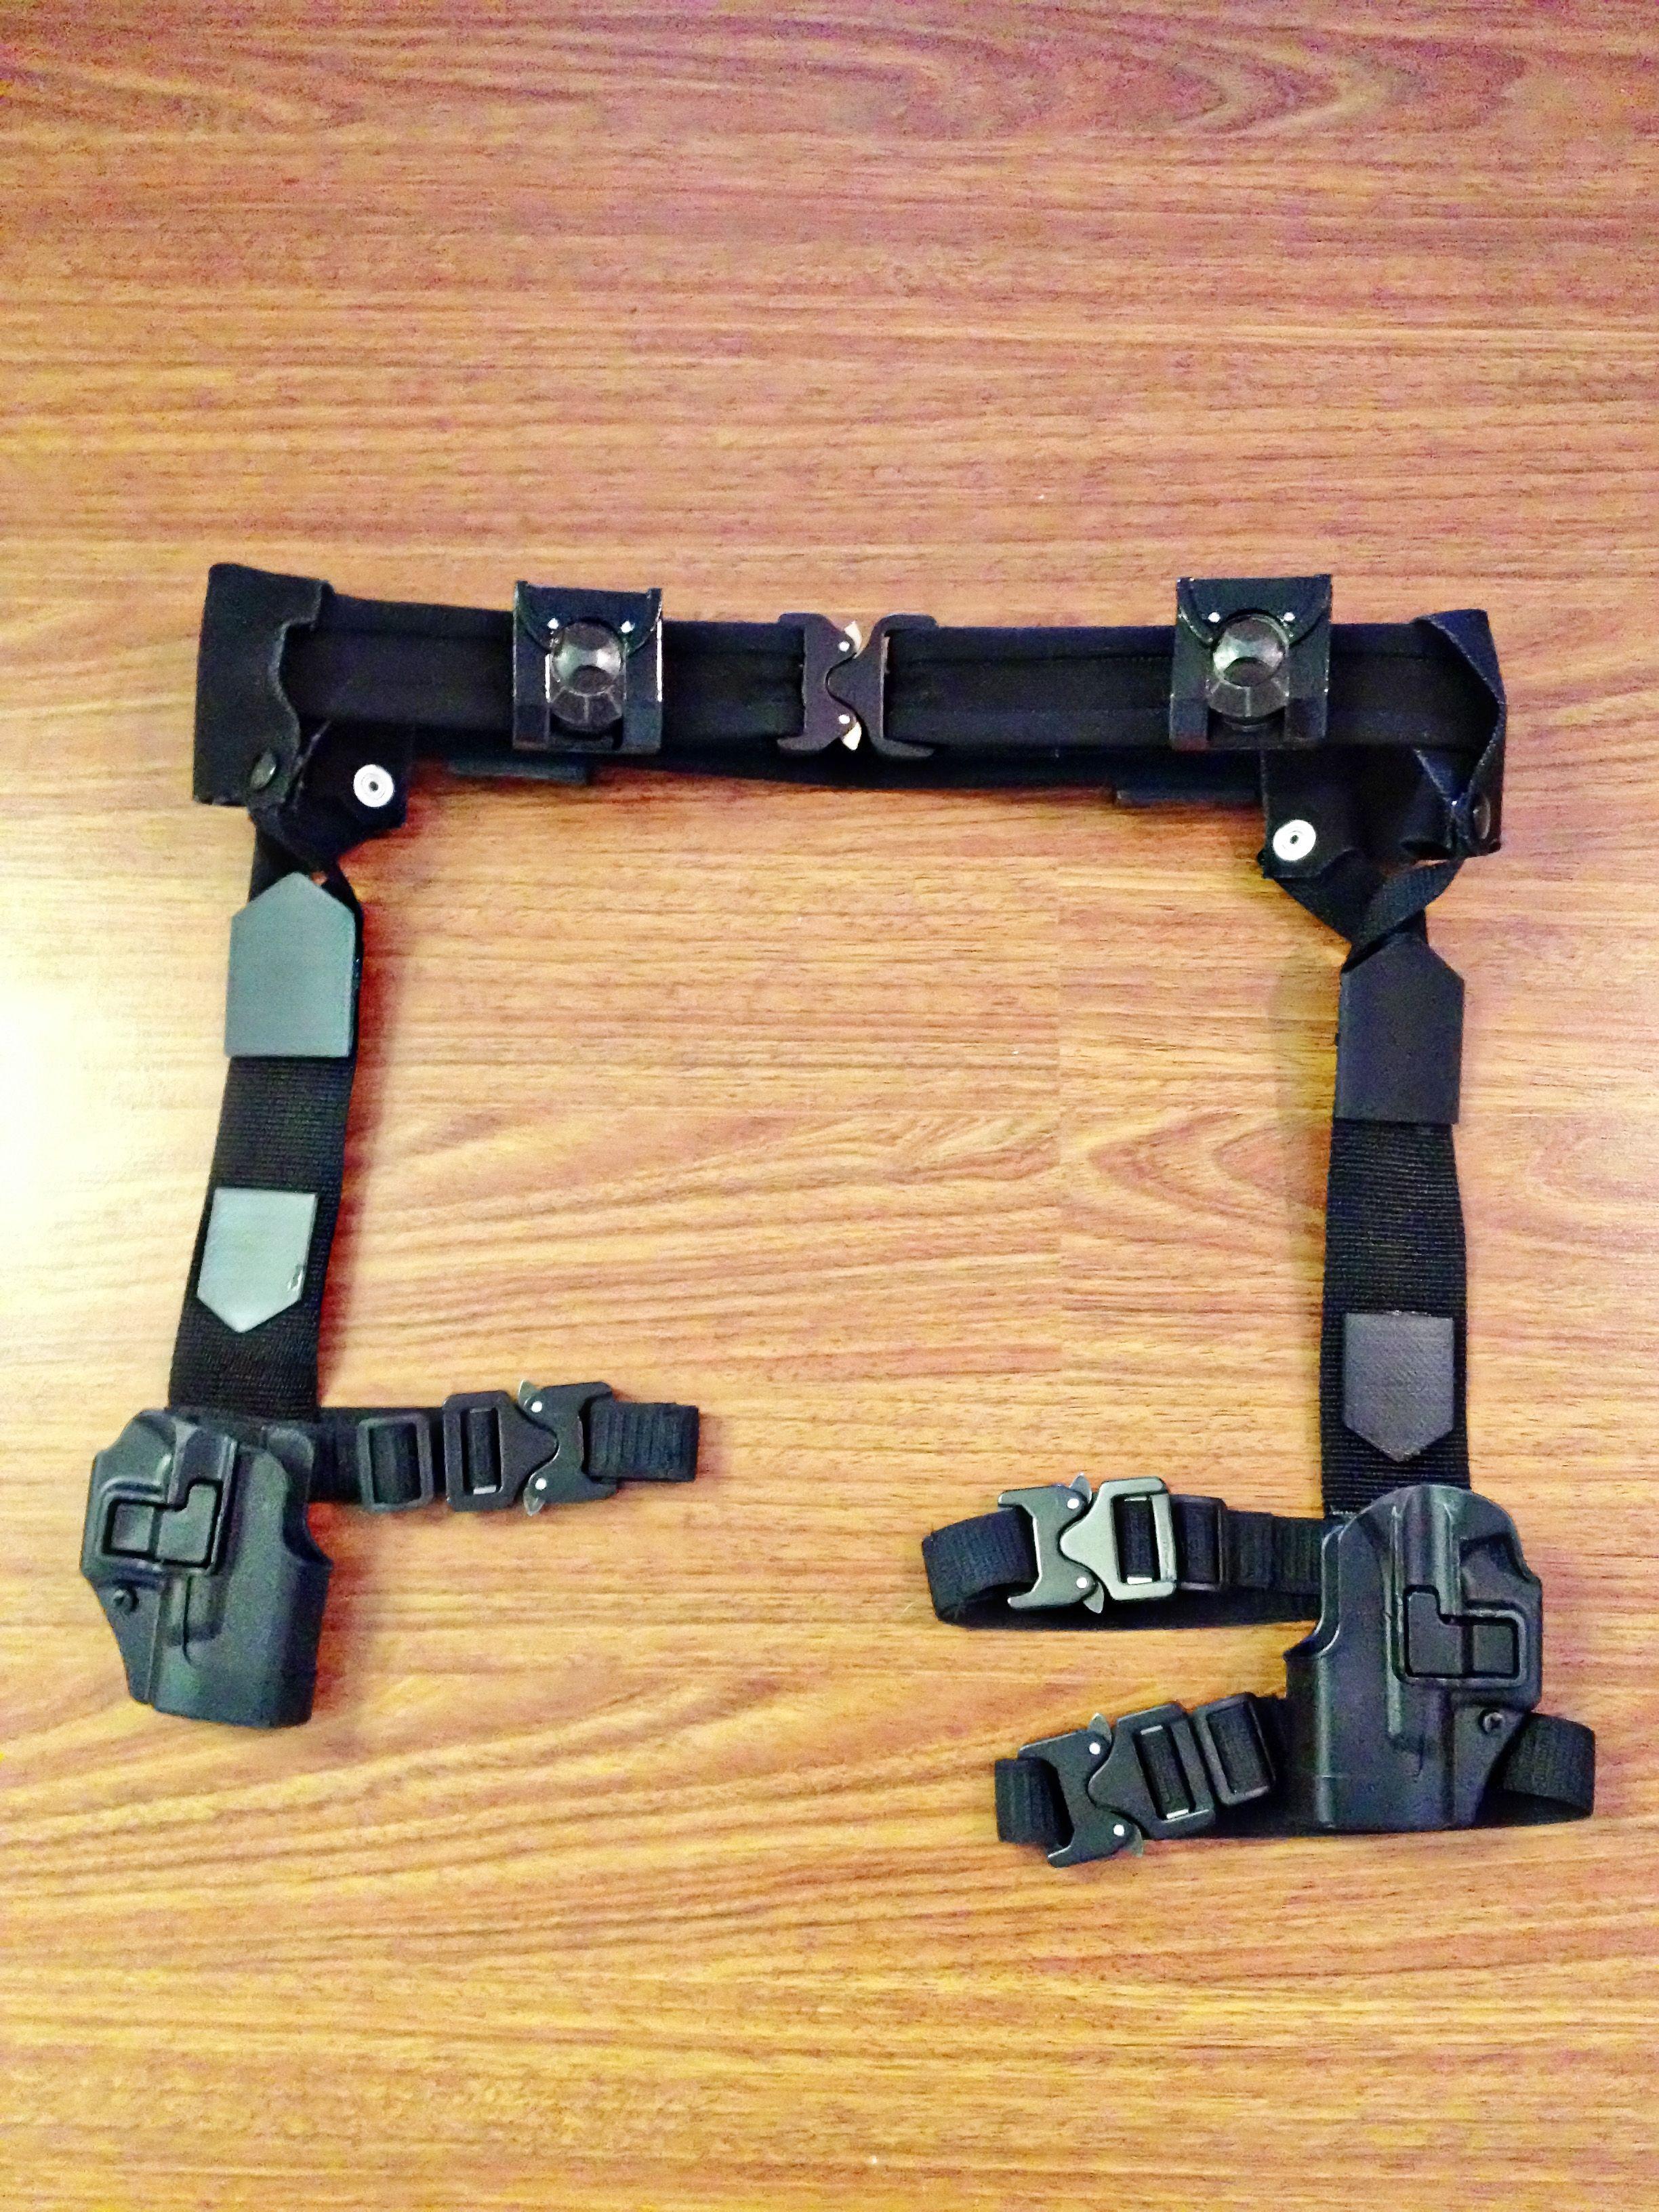 My finished upgraded gun belt